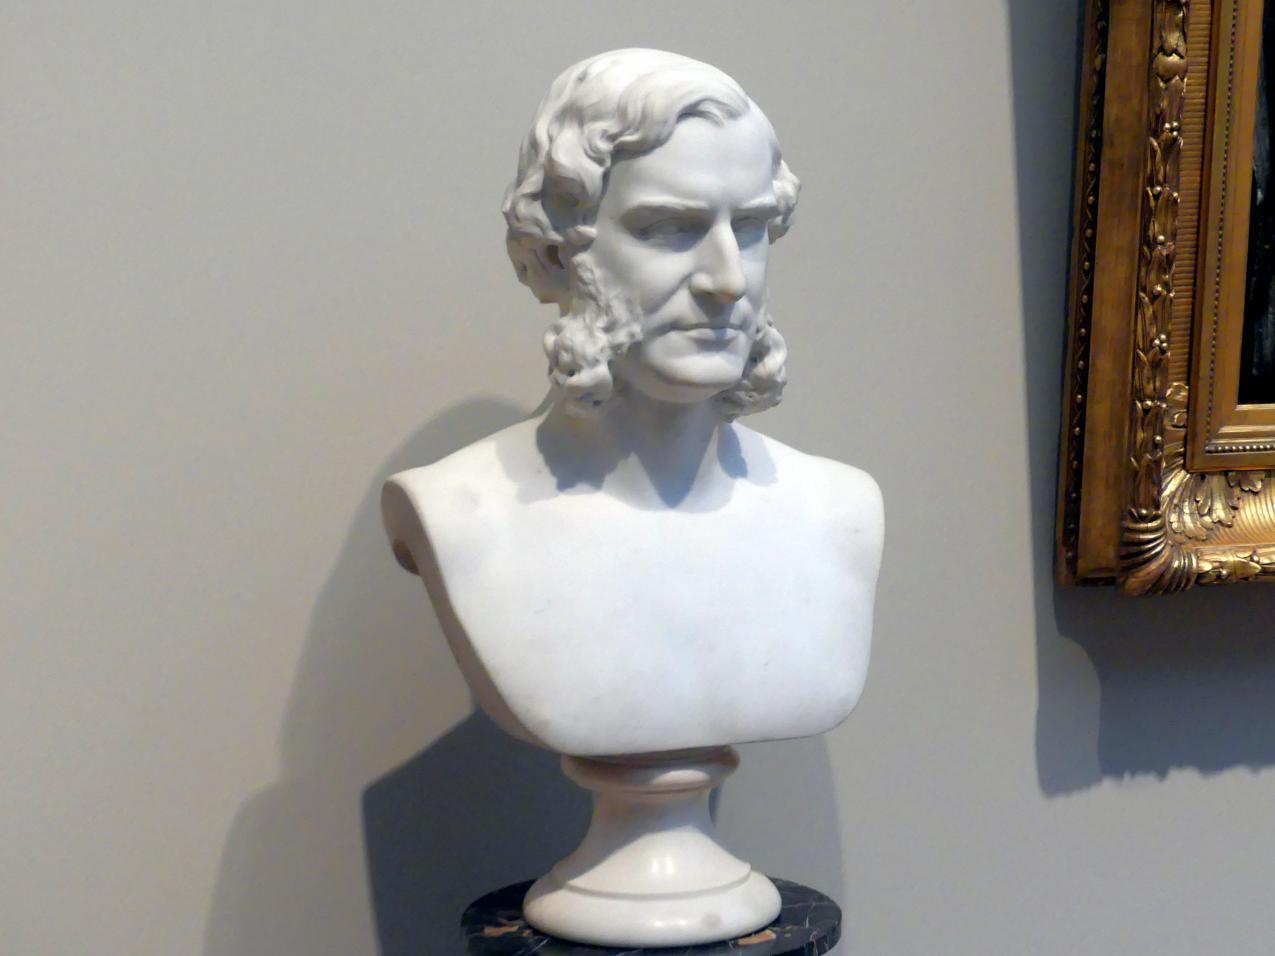 John Quincy Adams Ward: William Tilden Blodgett, 1865